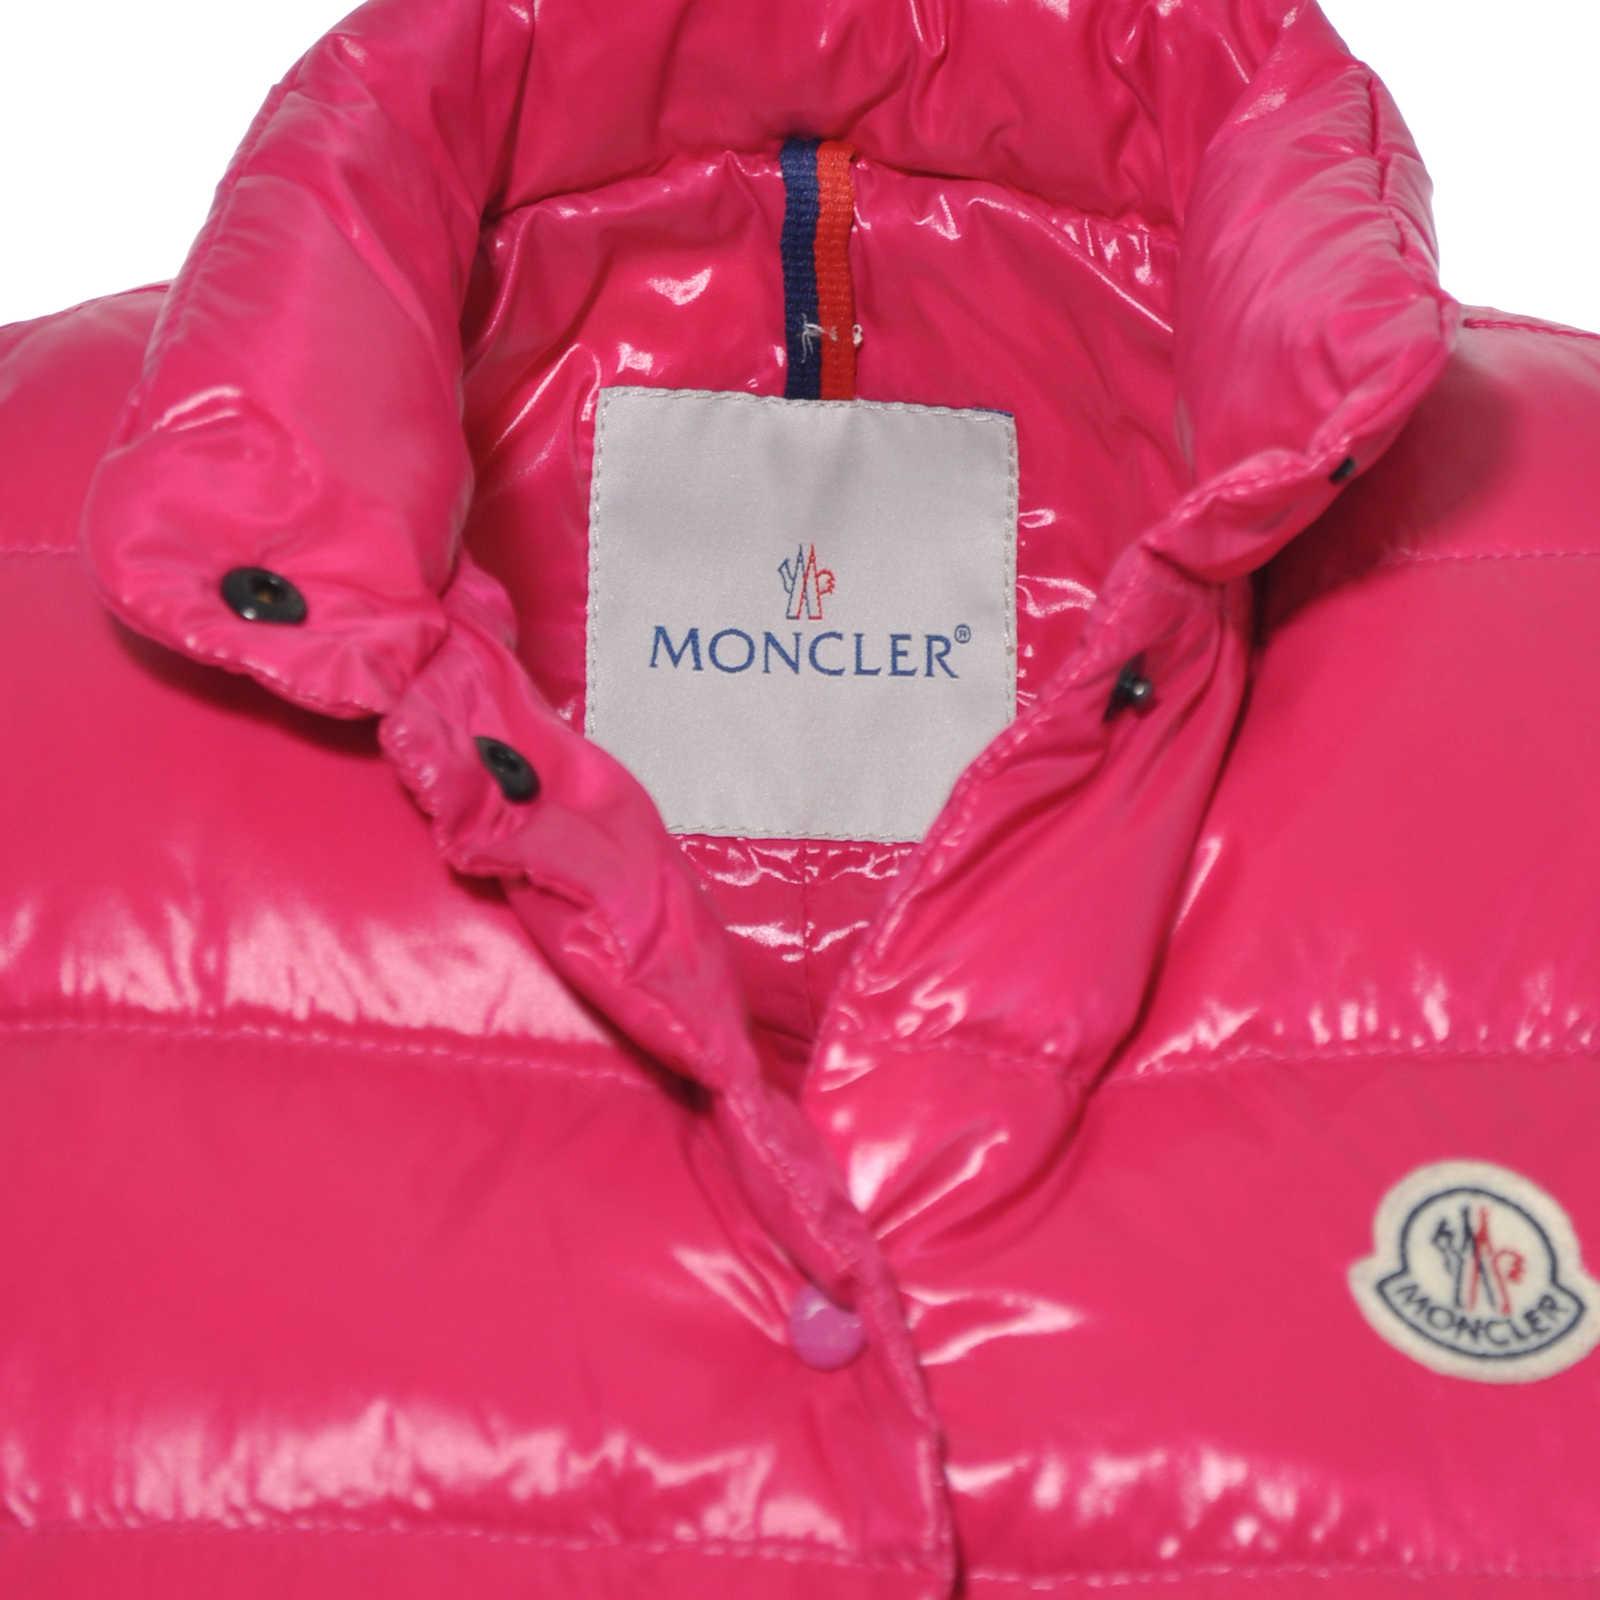 moncler jacket unboxing